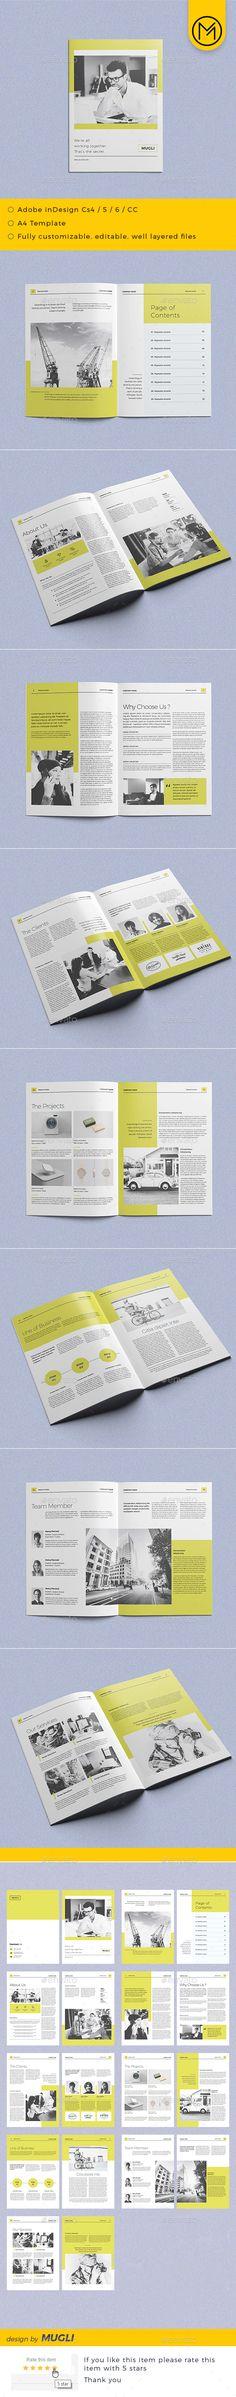 Travel Catalog \/ Brochure Brochures, Catalog and Brochure template - tourist brochure template